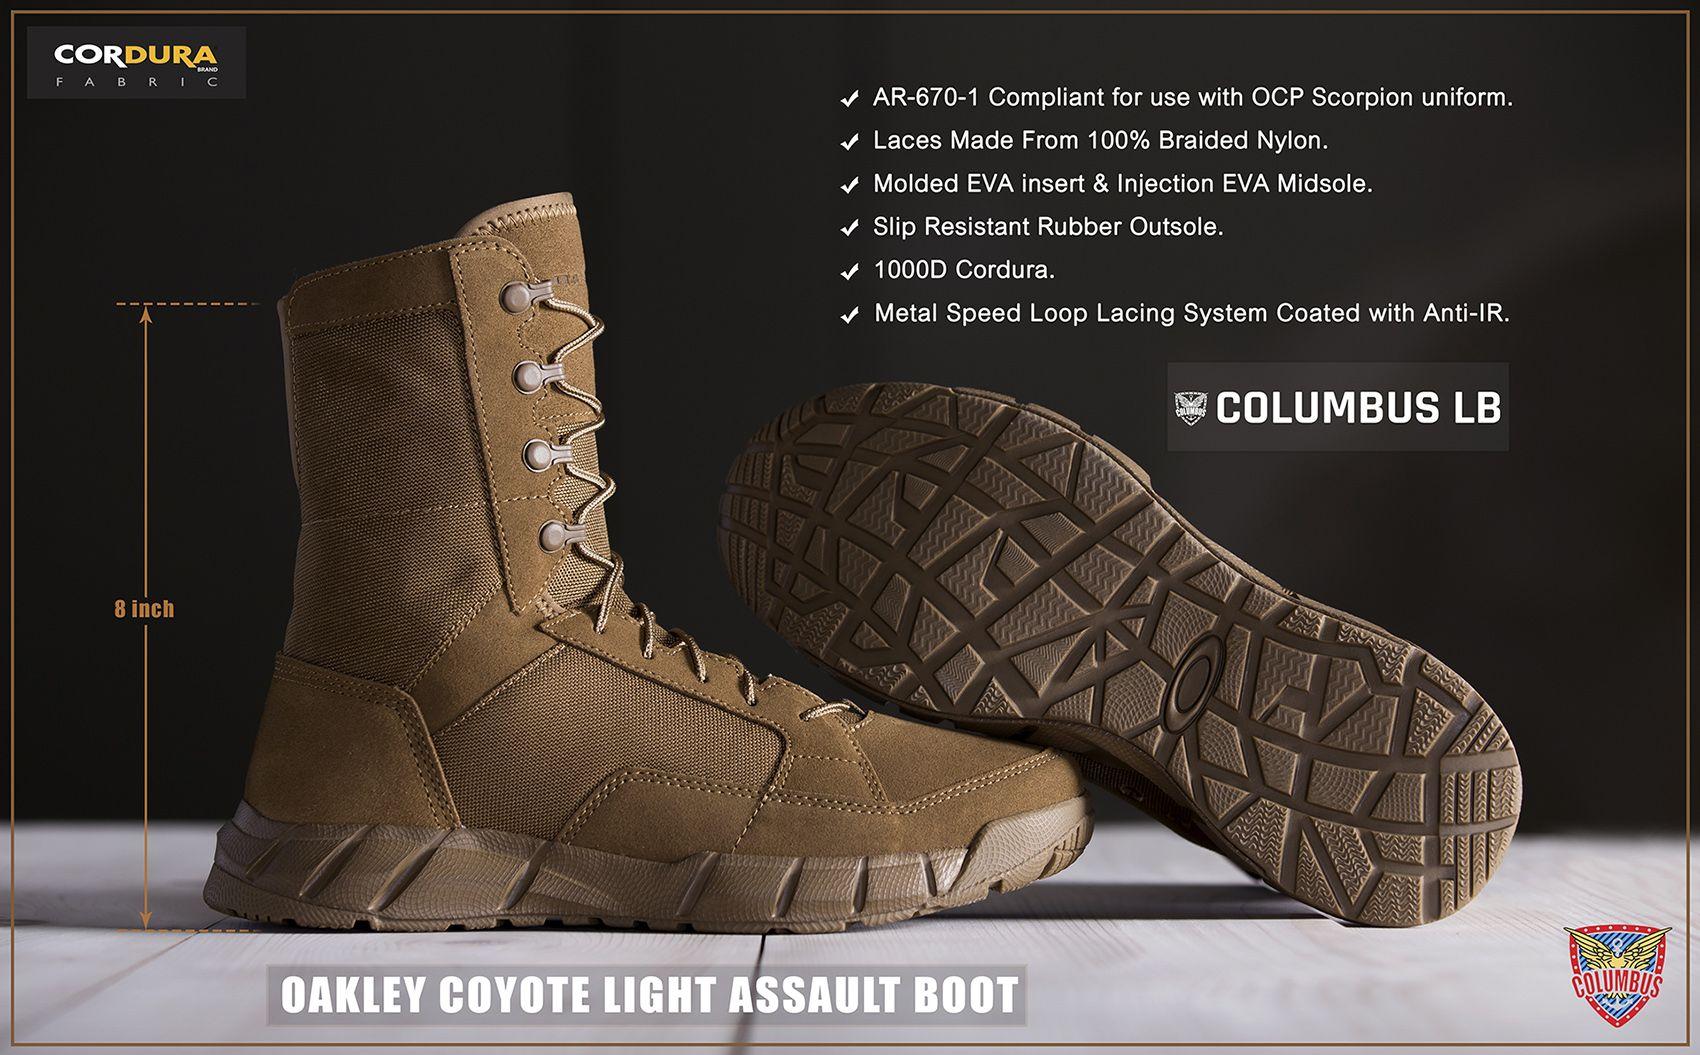 Oakley Coyote Light Assault Boot Oakley Military Boot Coyote Cordura Columbus Columbuslb Columbuslebanon Tripoli Lebanon Boots Combat Boots Oakley